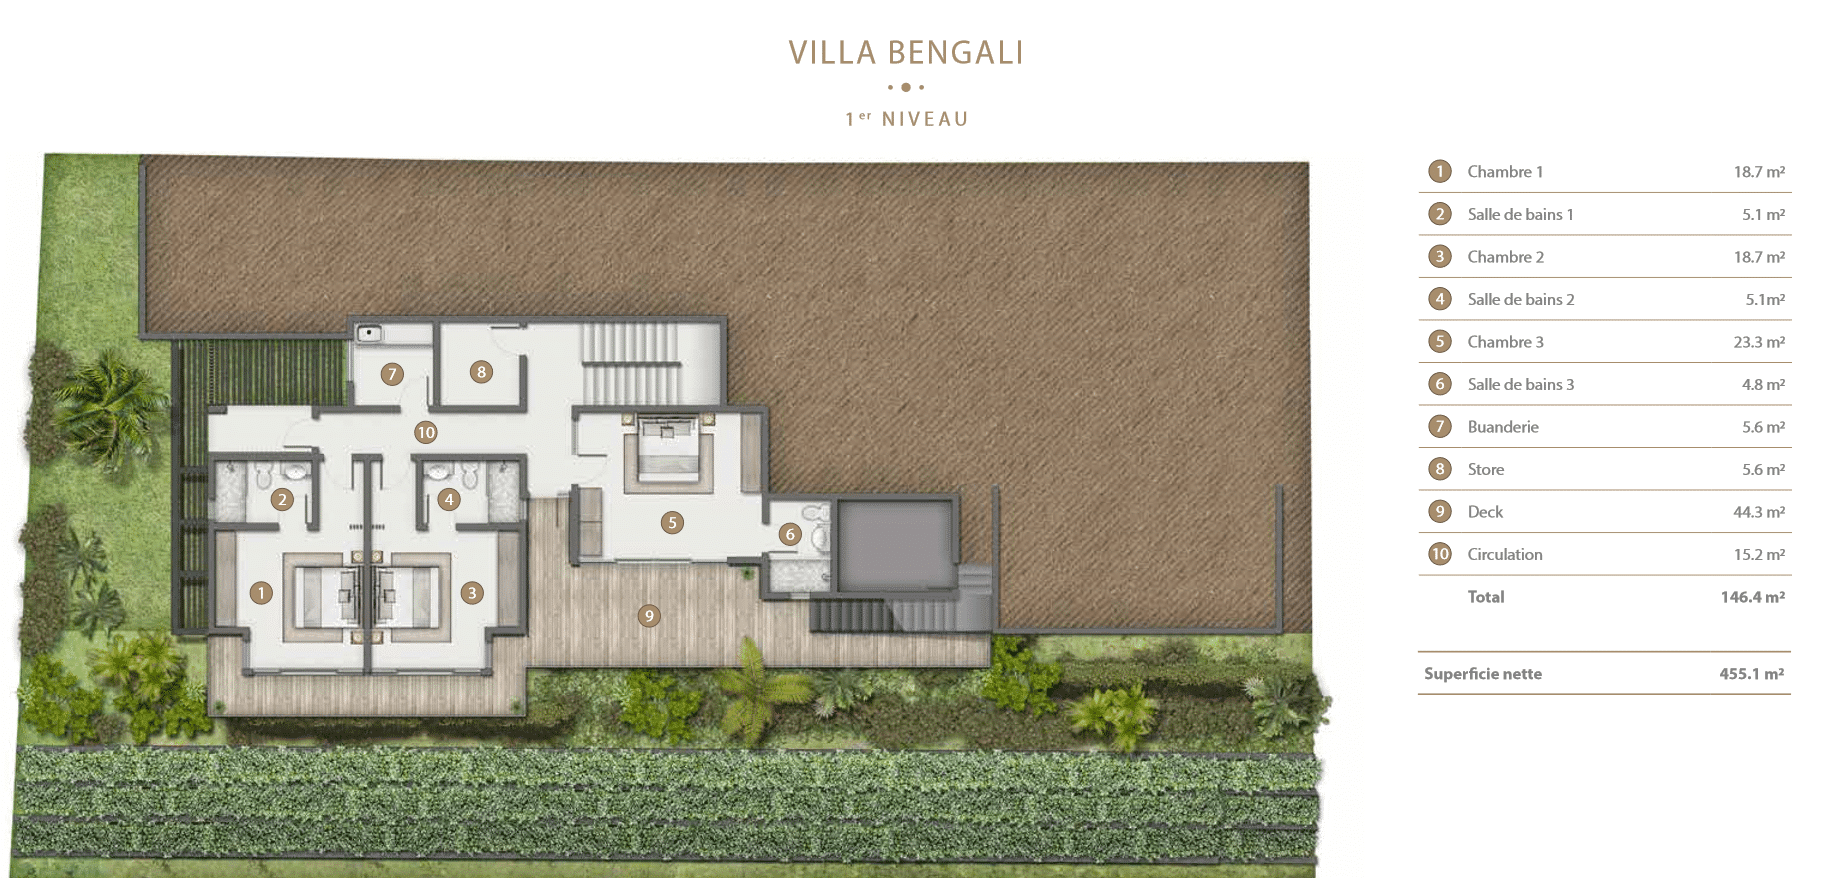 Villa Bengali Legend Hill Ile Maurice